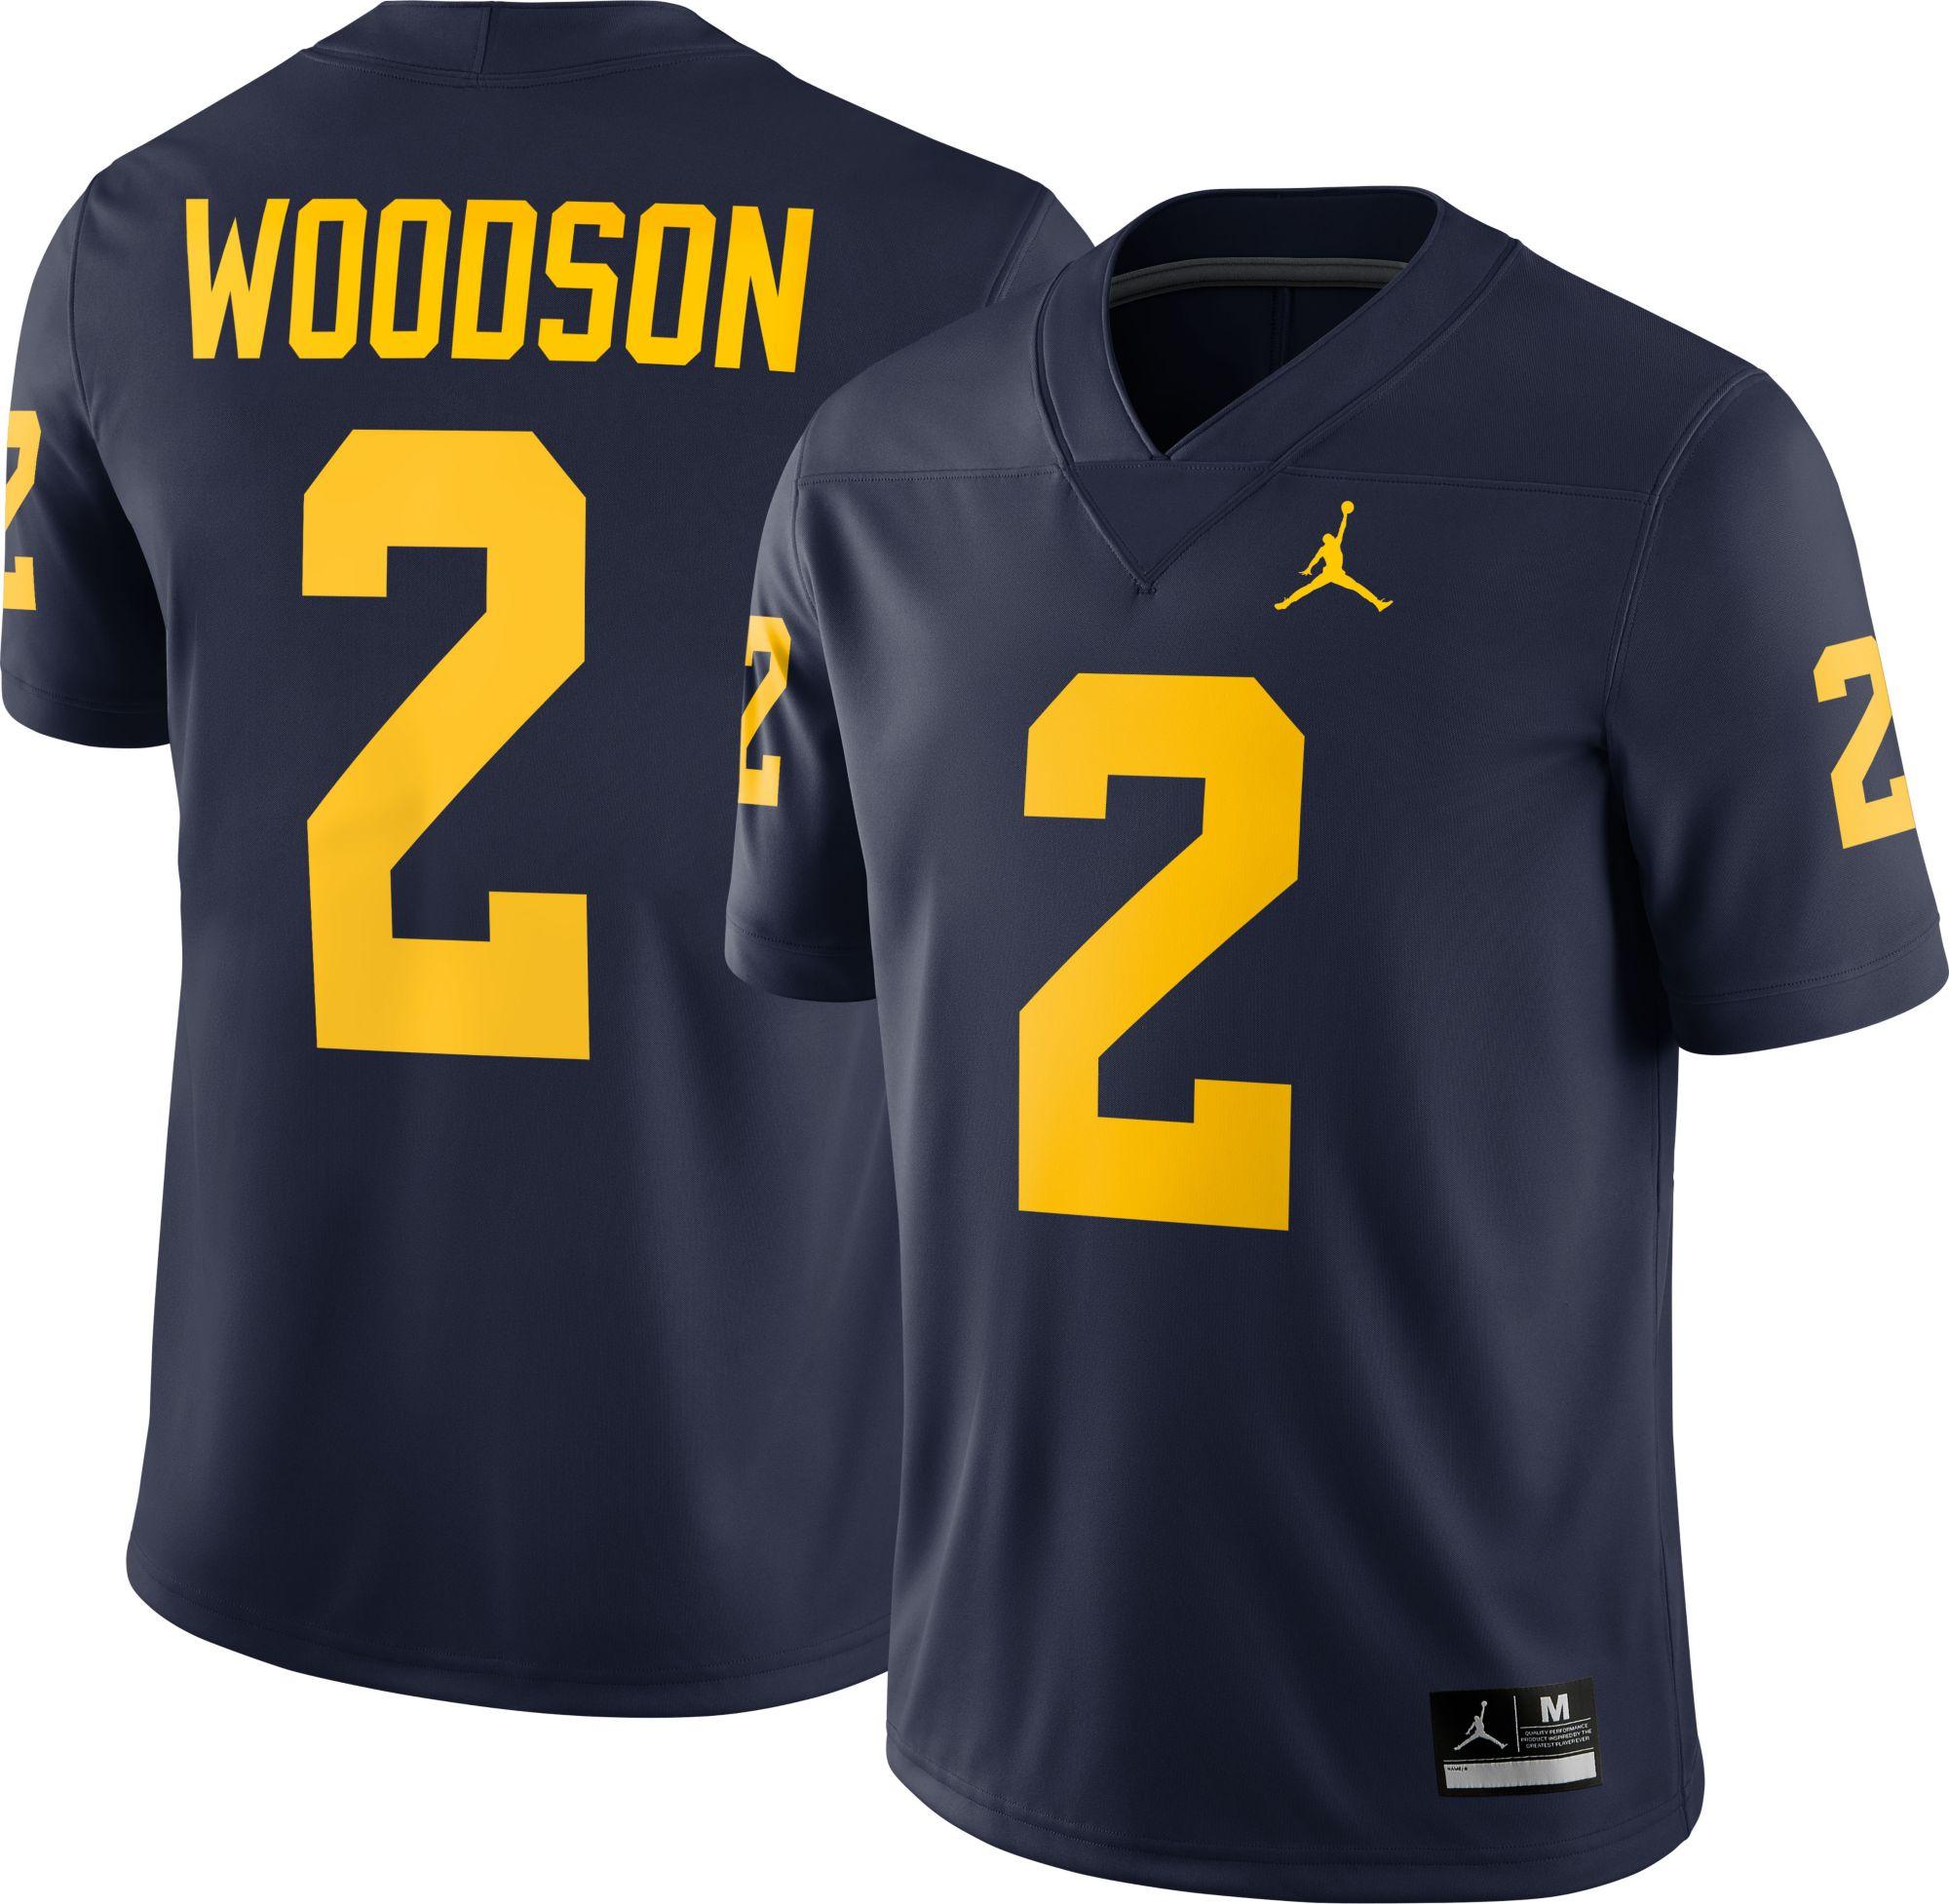 799b160caf2c Jordan Men s Michigan Wolverines Blue Lockdown Football Quarter-Zip Jacket.  ().  47.97. View All. Alternate Images 1 of 3